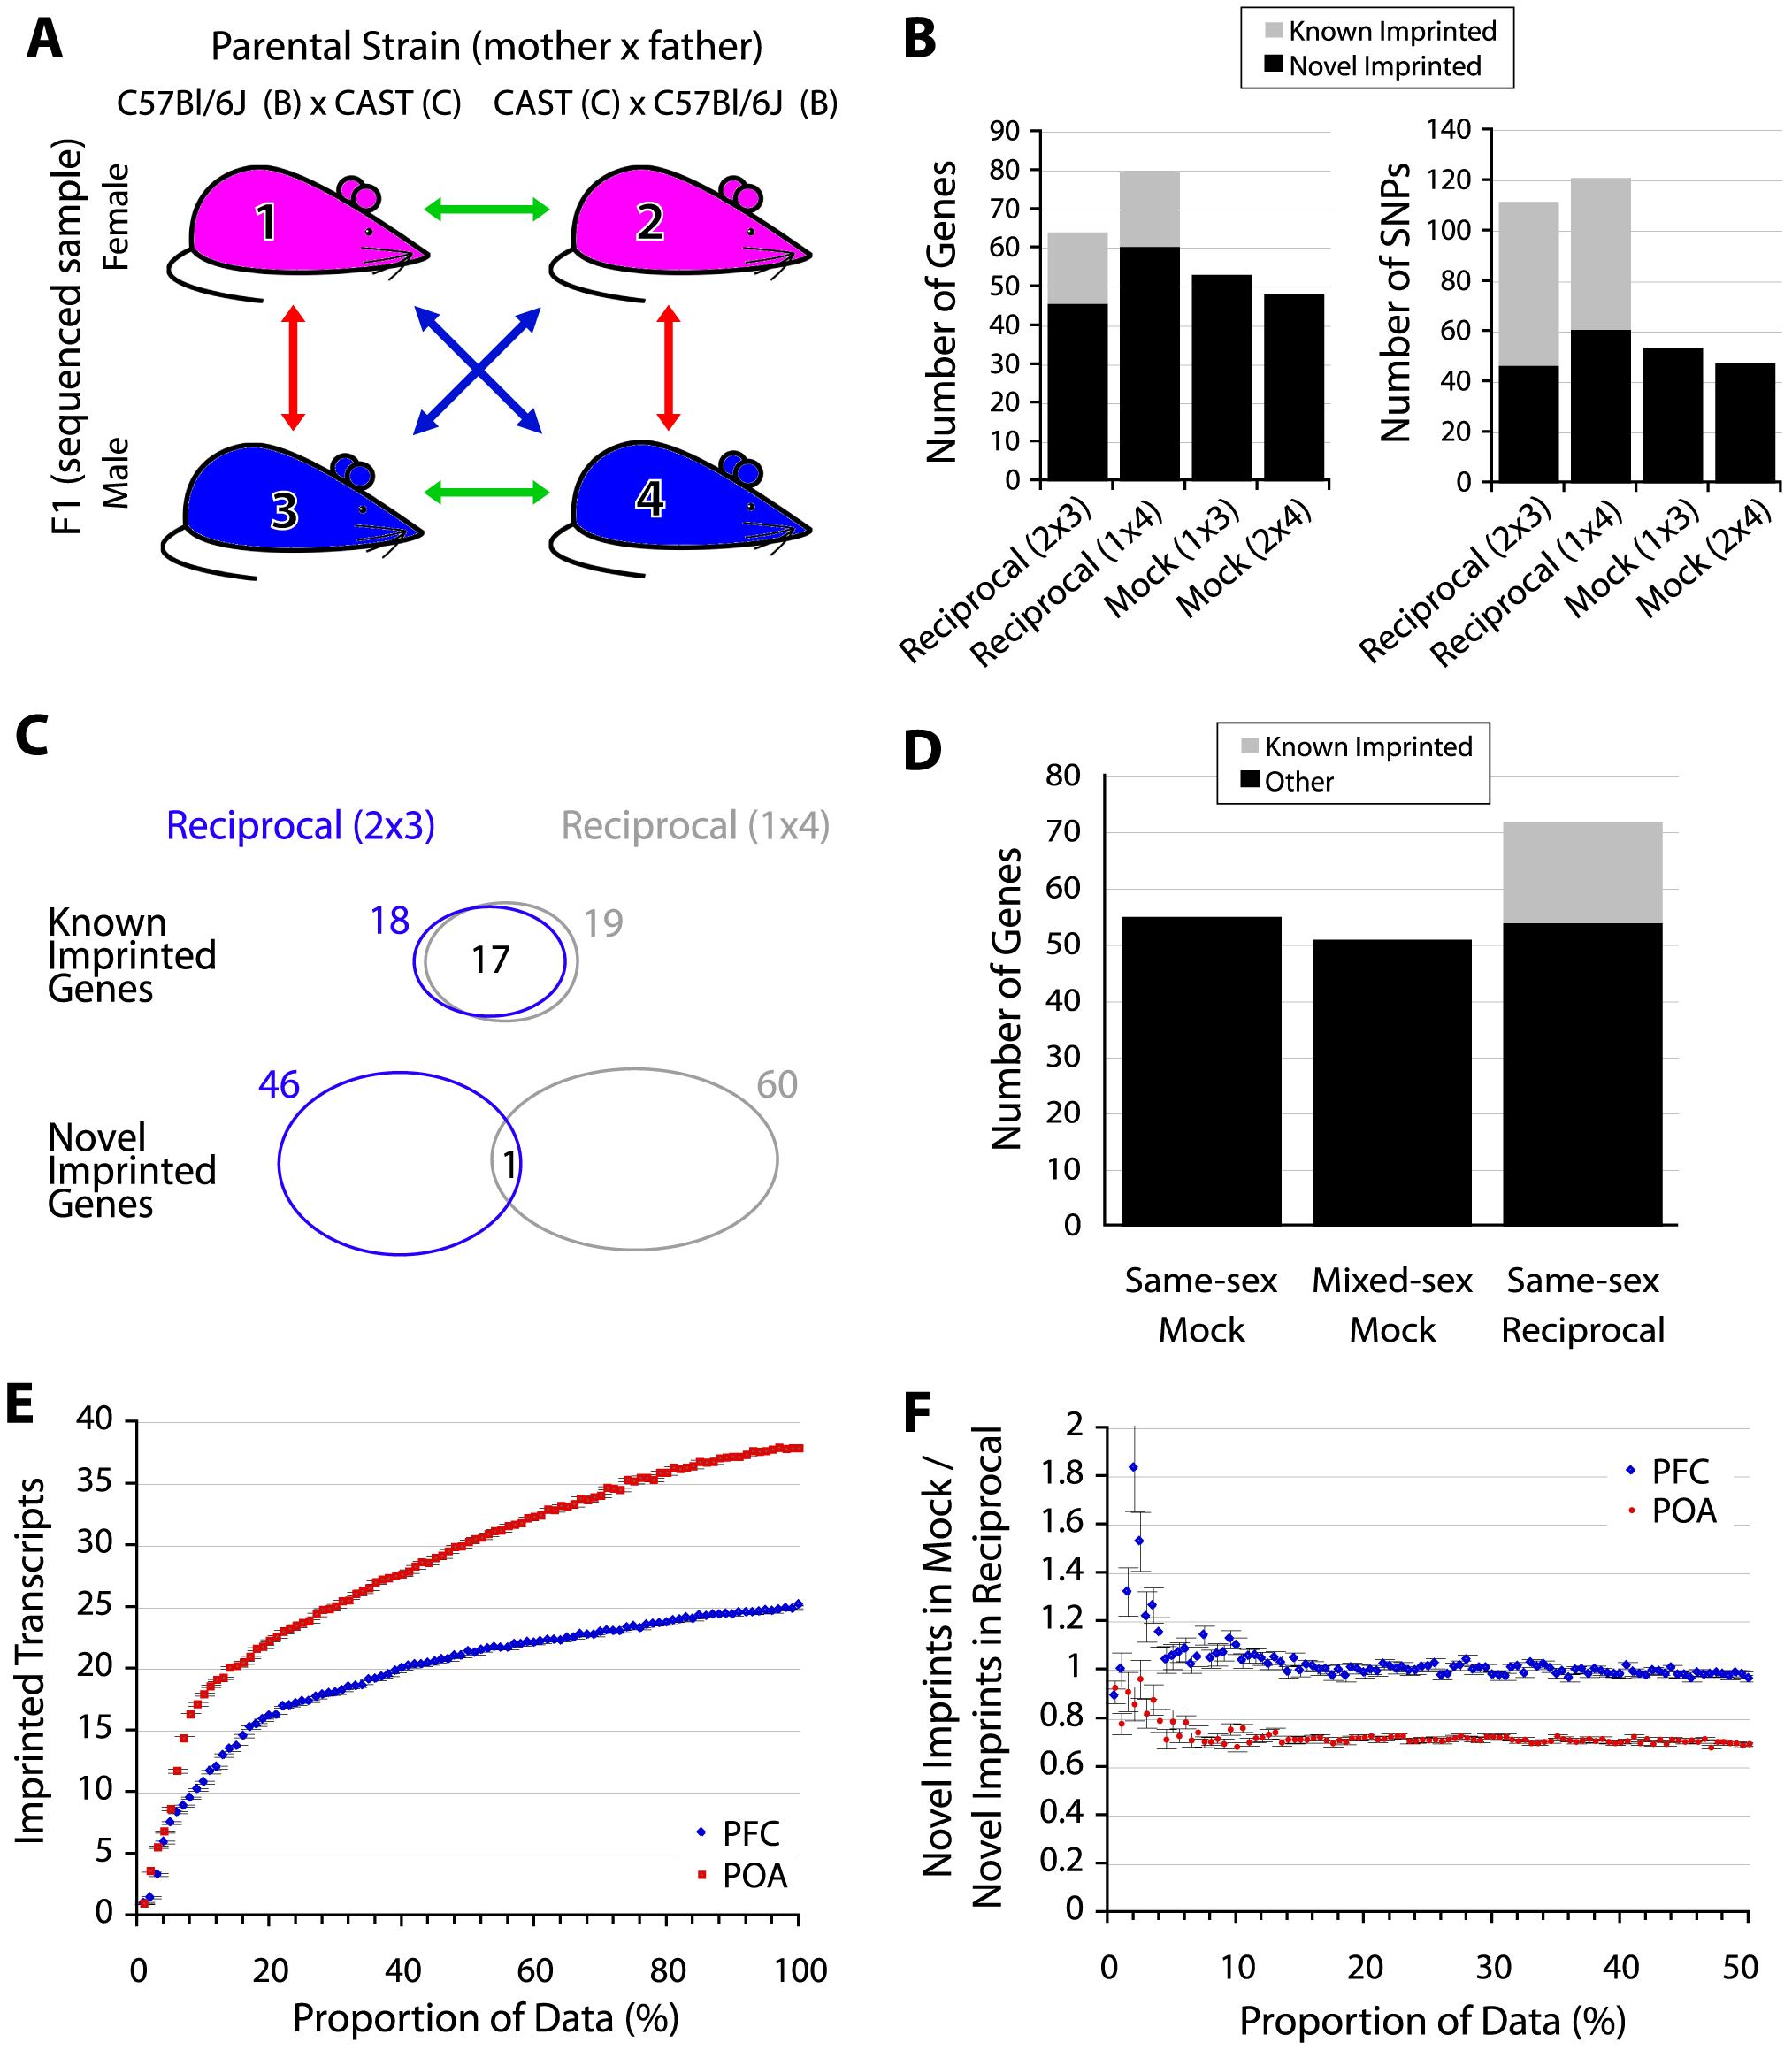 False discoveries explain the majority of novel imprinted genes.